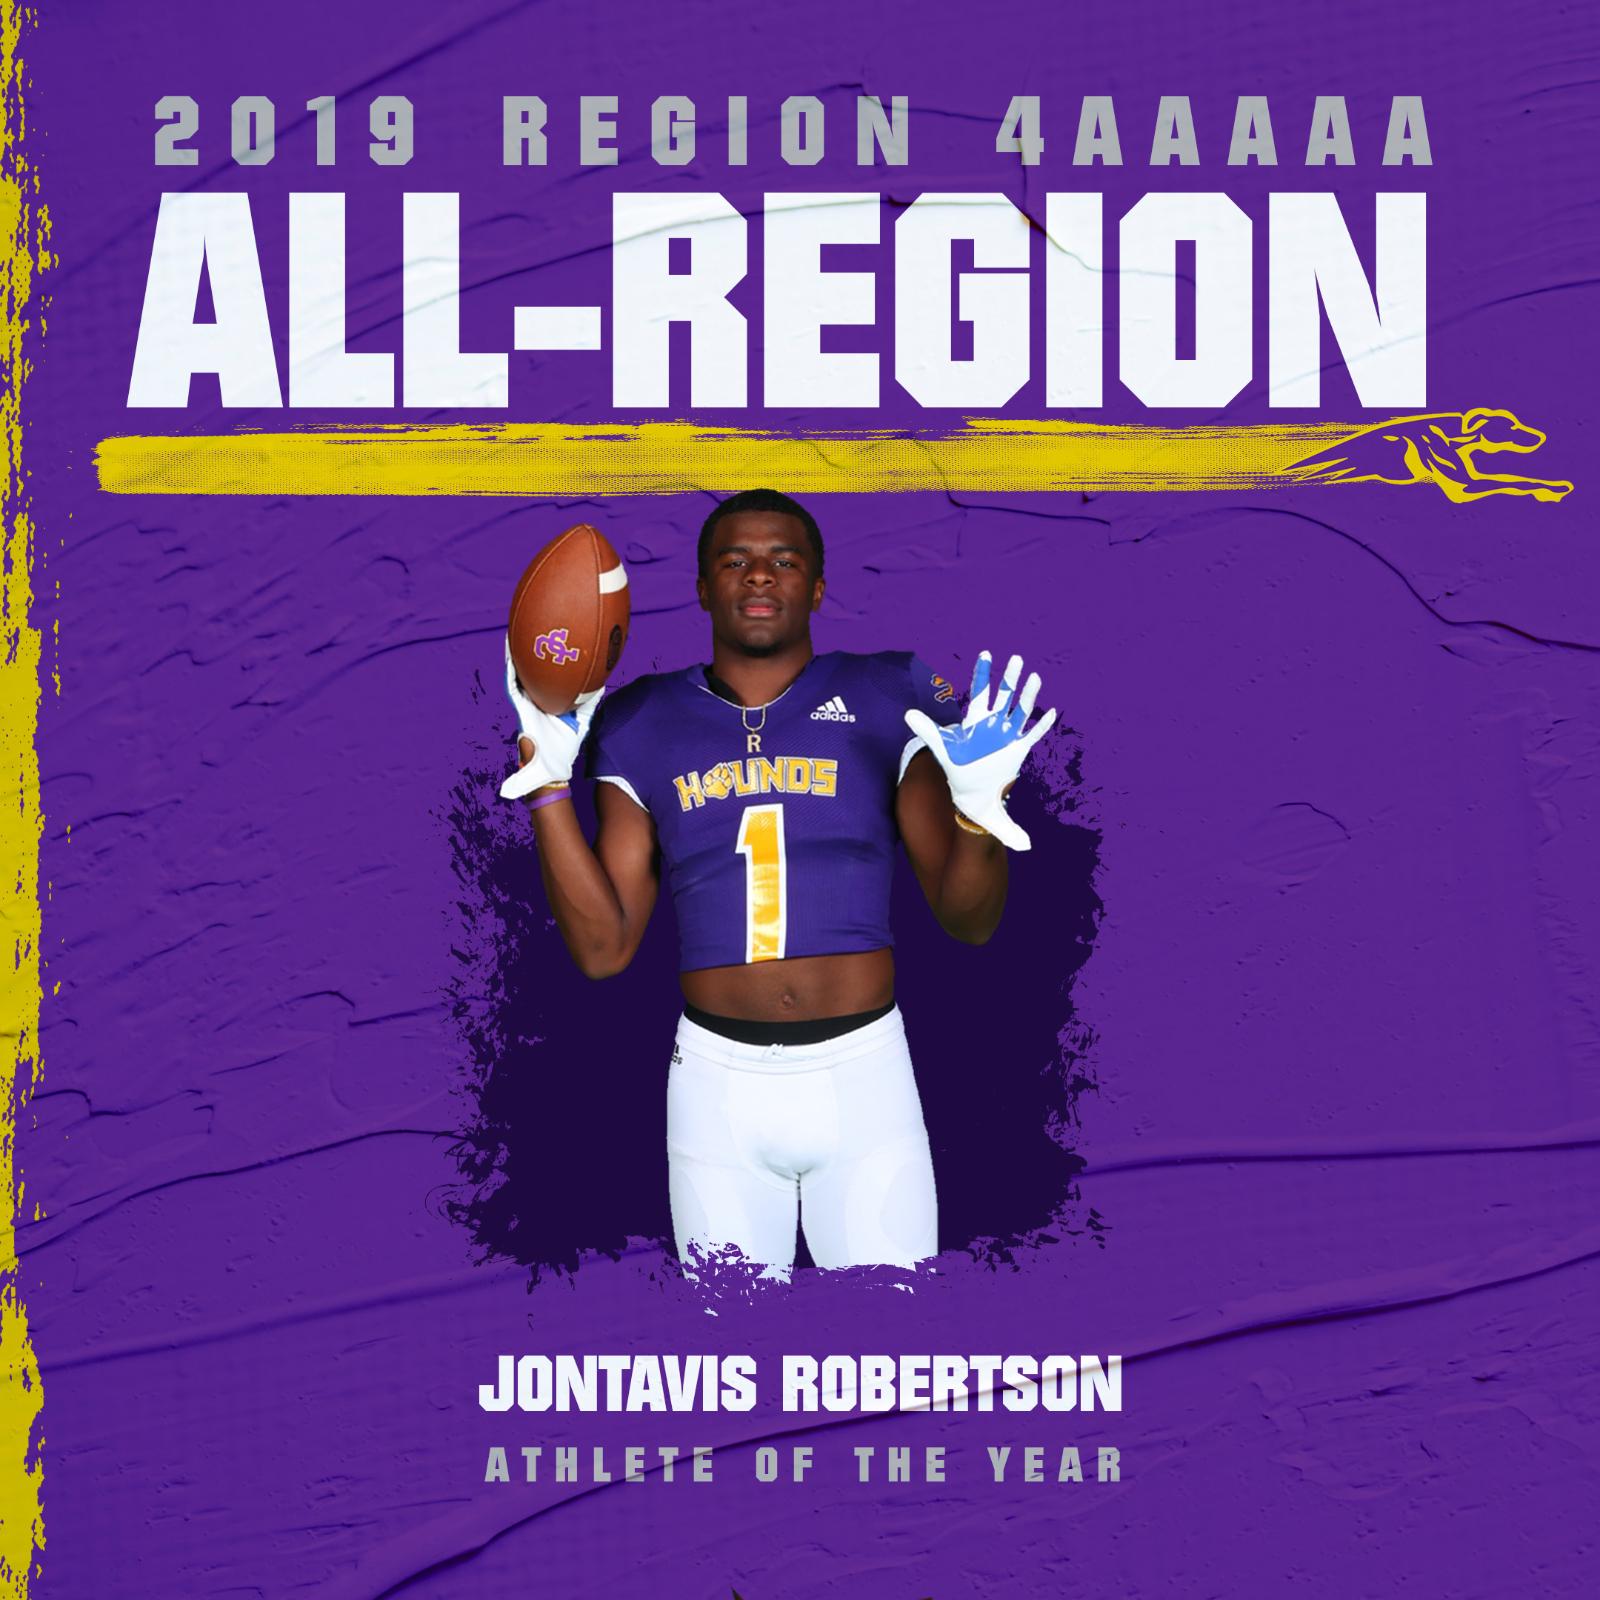 Football Athletes Named to 2019 All-Region Team